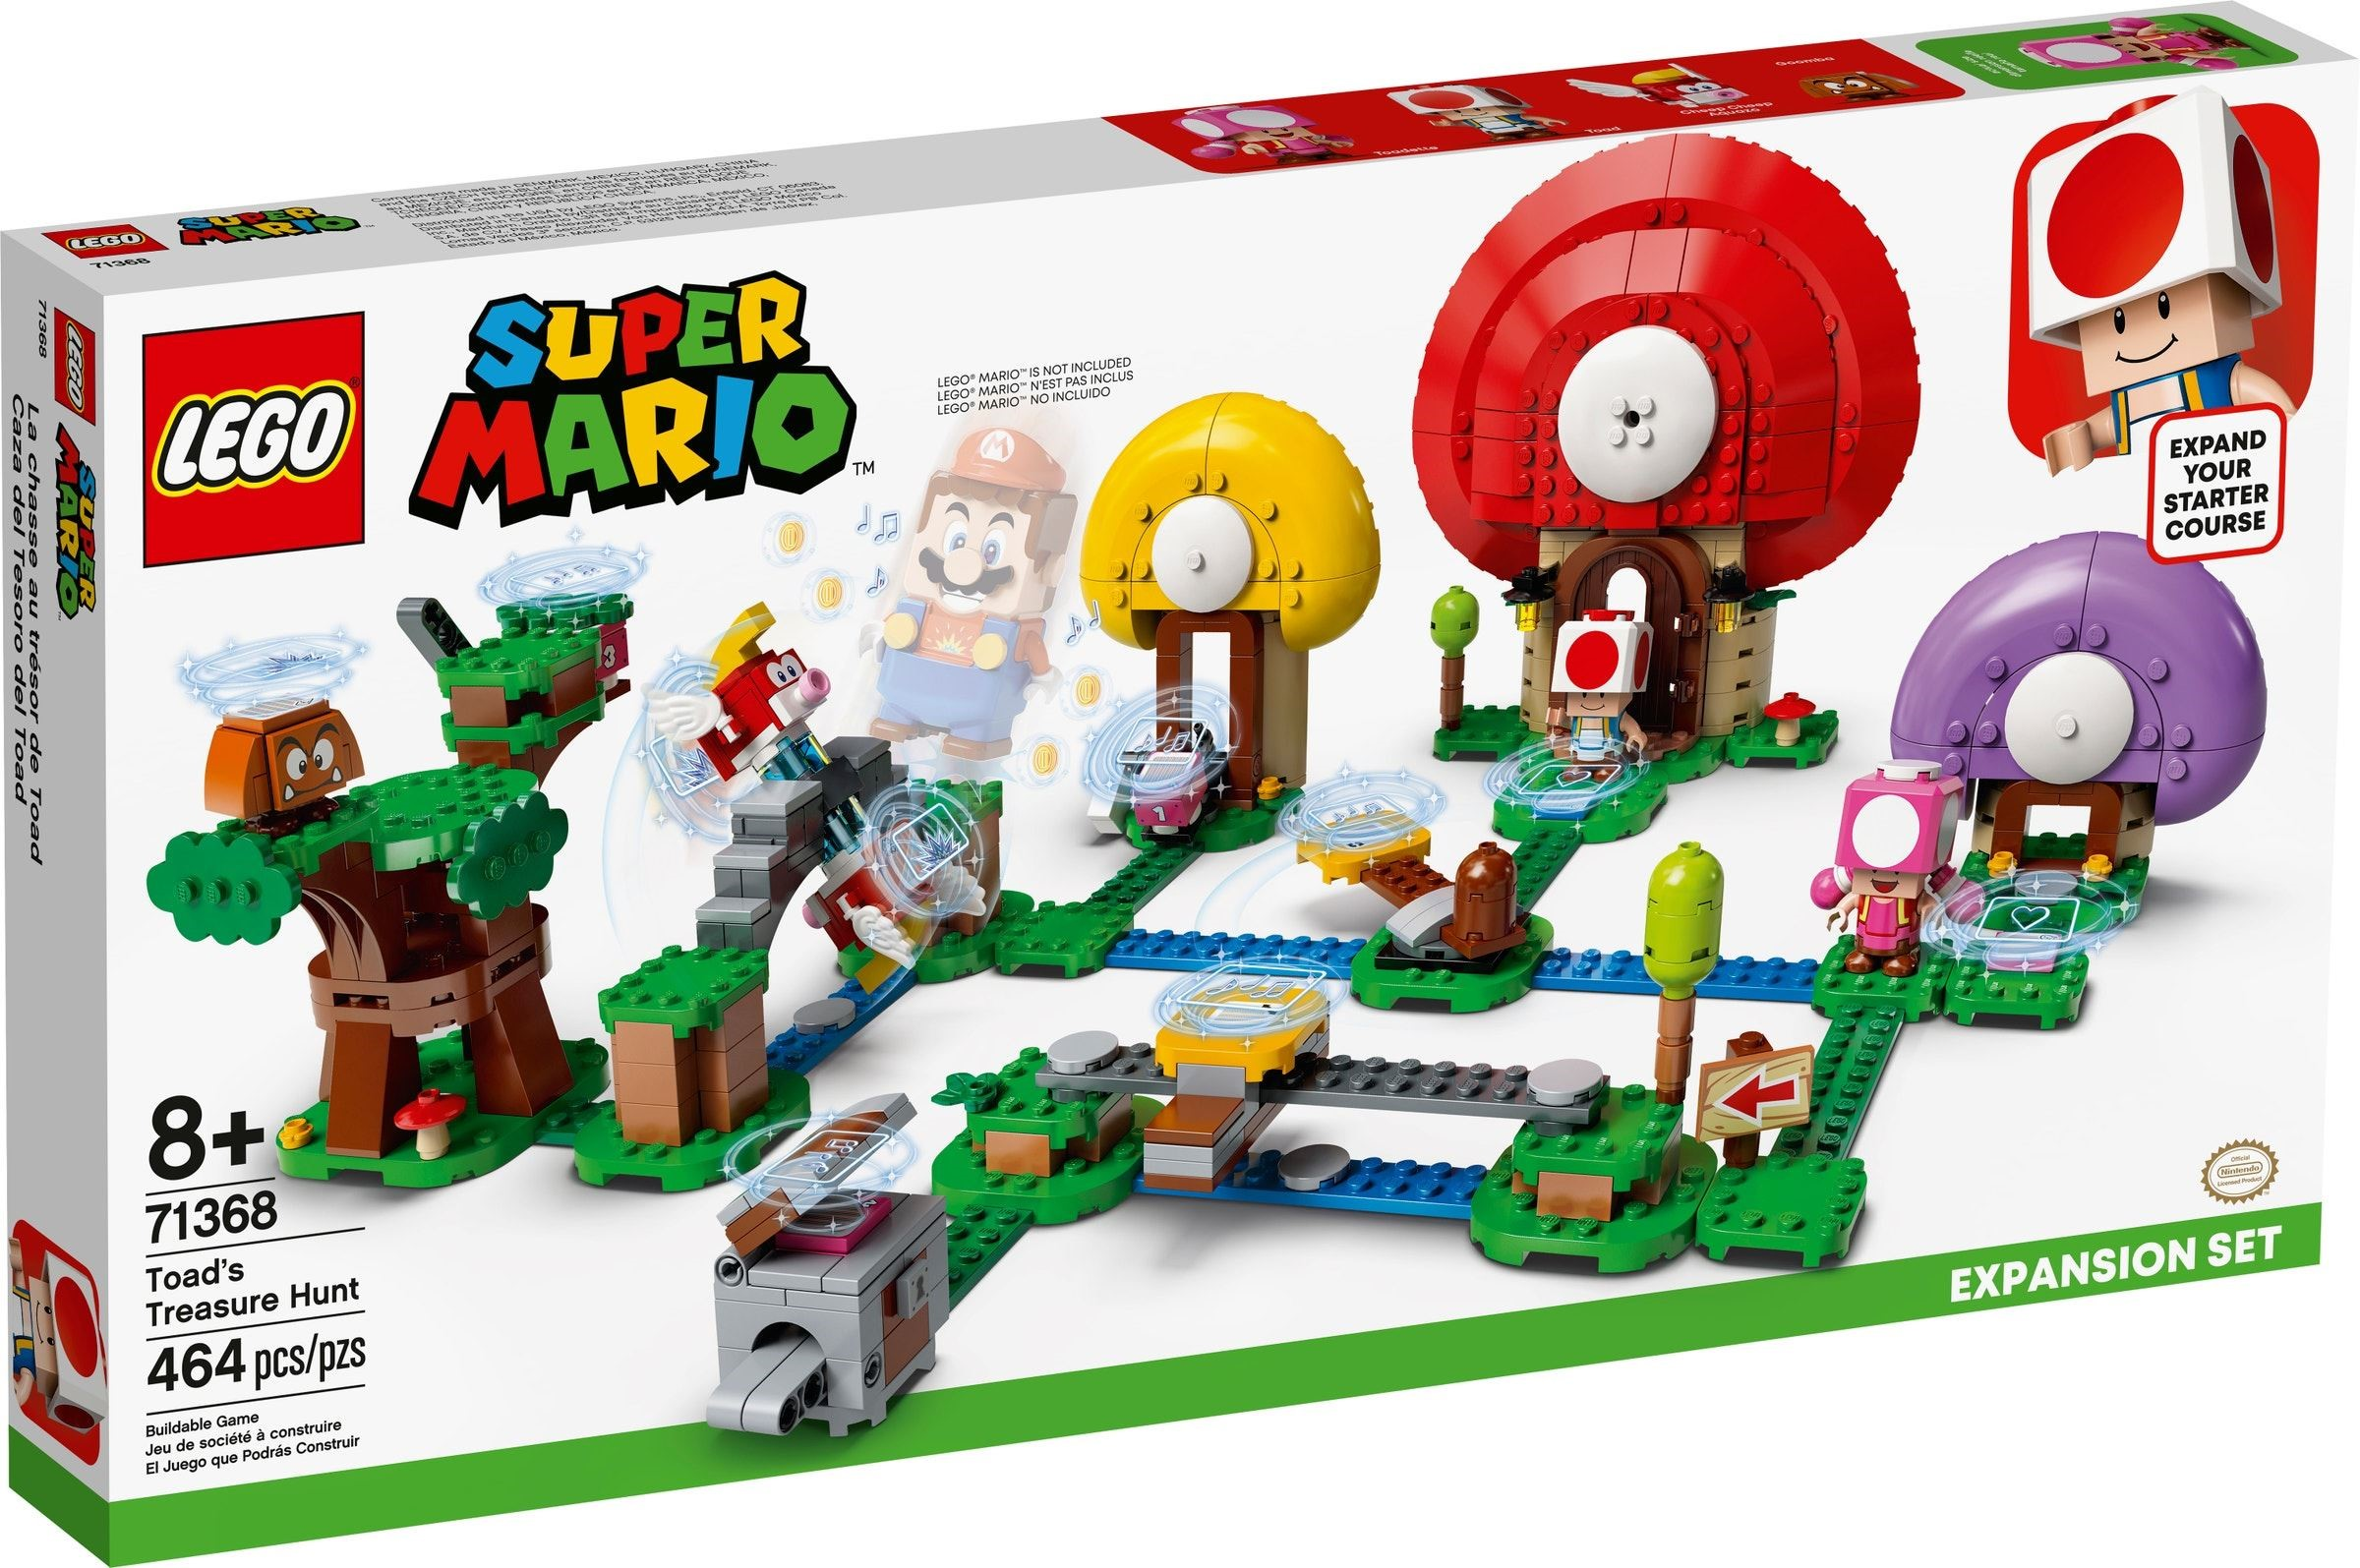 LEGO Super Mario - Toad's Treasure Hunt Expansion Set (71368)